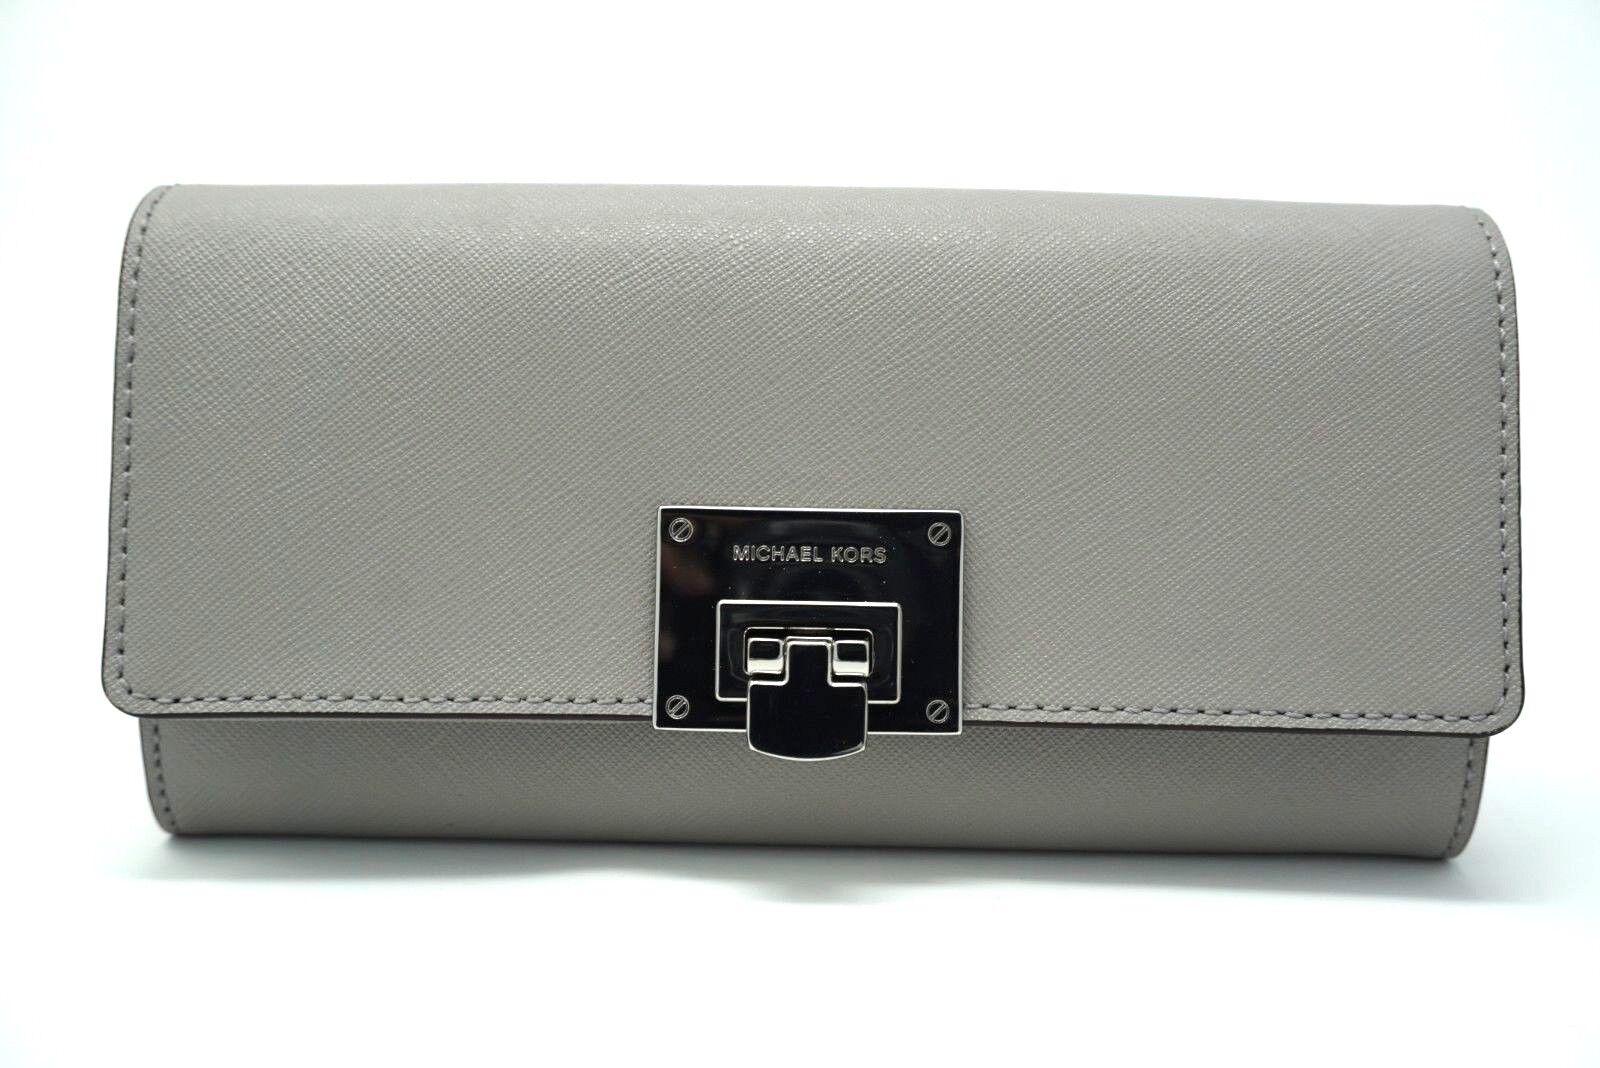 e2cbc7784eb0 Michael Kors Tina Carryall Ash Grey Saffiano Leather Clutch Wallet ...